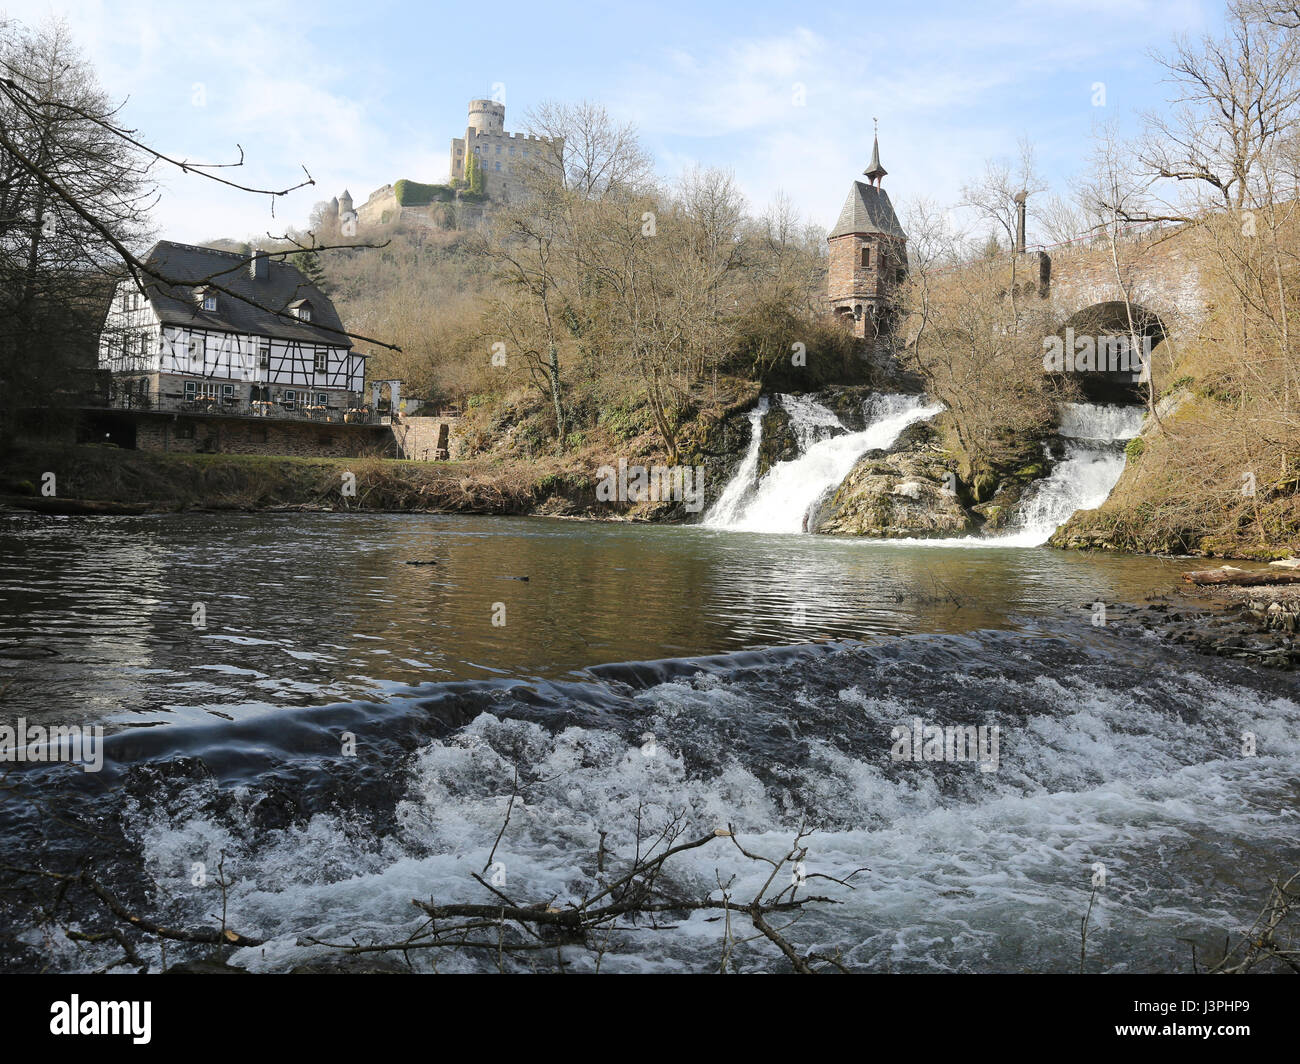 Elzbach Wasserfall, Germania, Eifel, Cascata Elzbach e il castello di Pyrmont Renania Palatinato Foto Stock